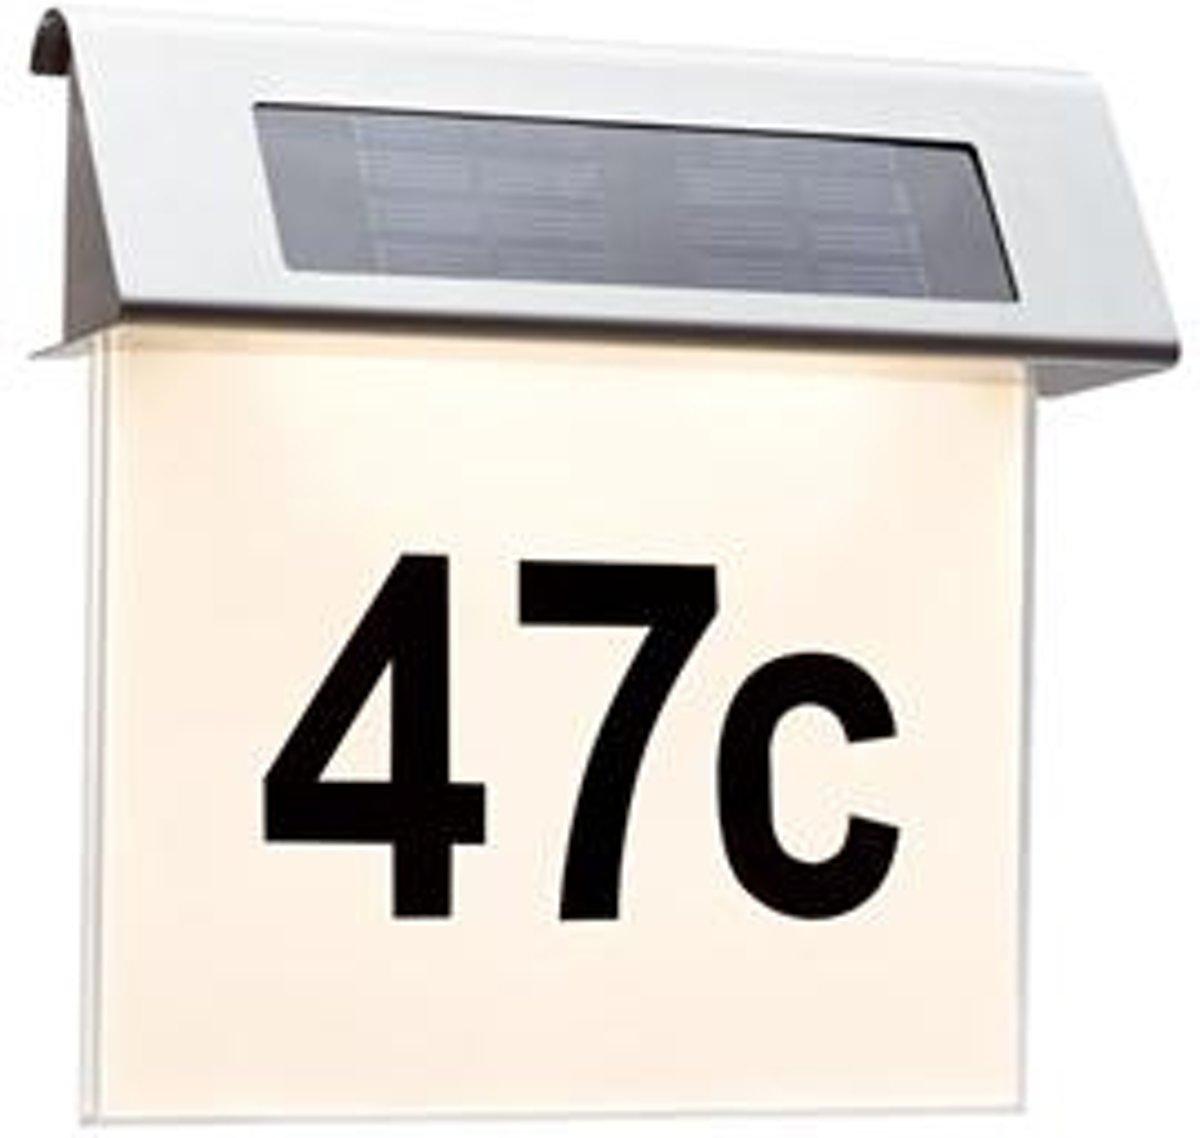 Special huisnummerverlichting op zonne-energie IP44 LED 1x0,2 W, roestvrij staal/wit roestvrij staal/acryl